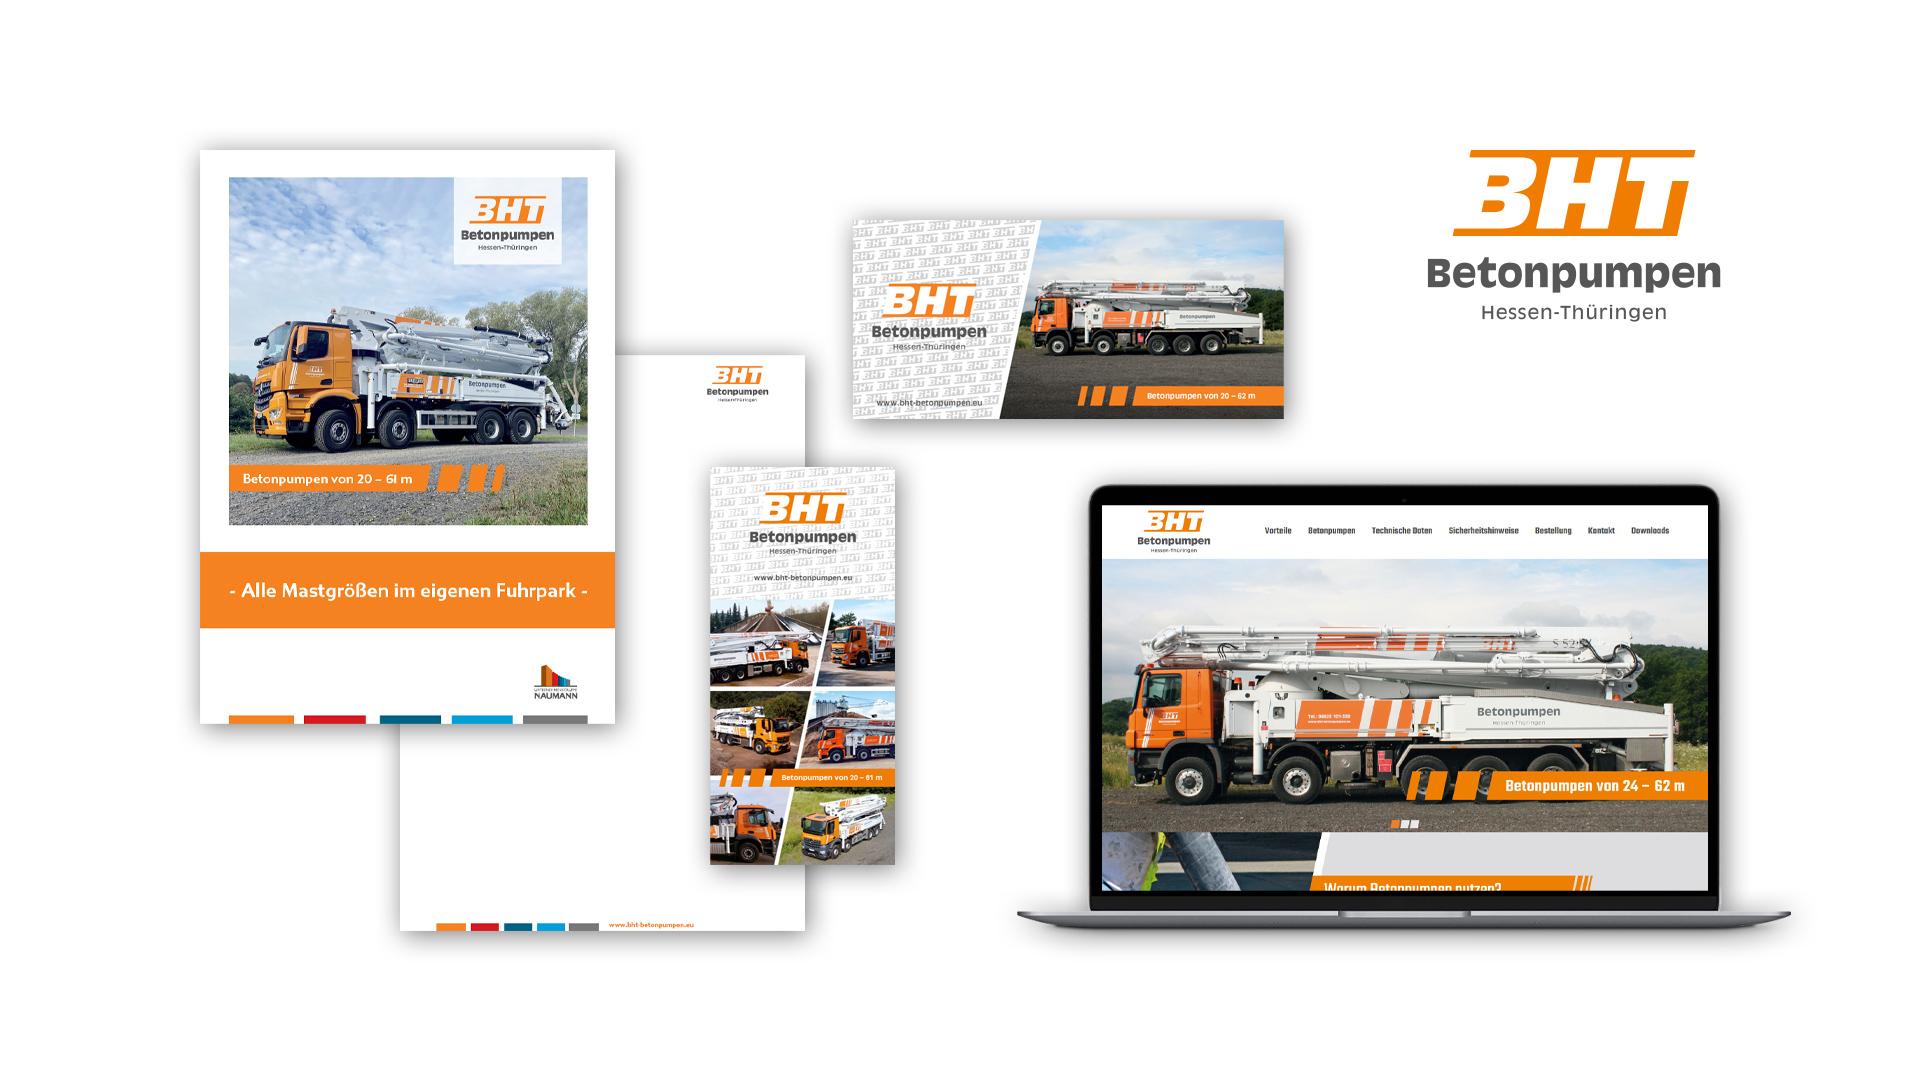 Webdesign – BHT